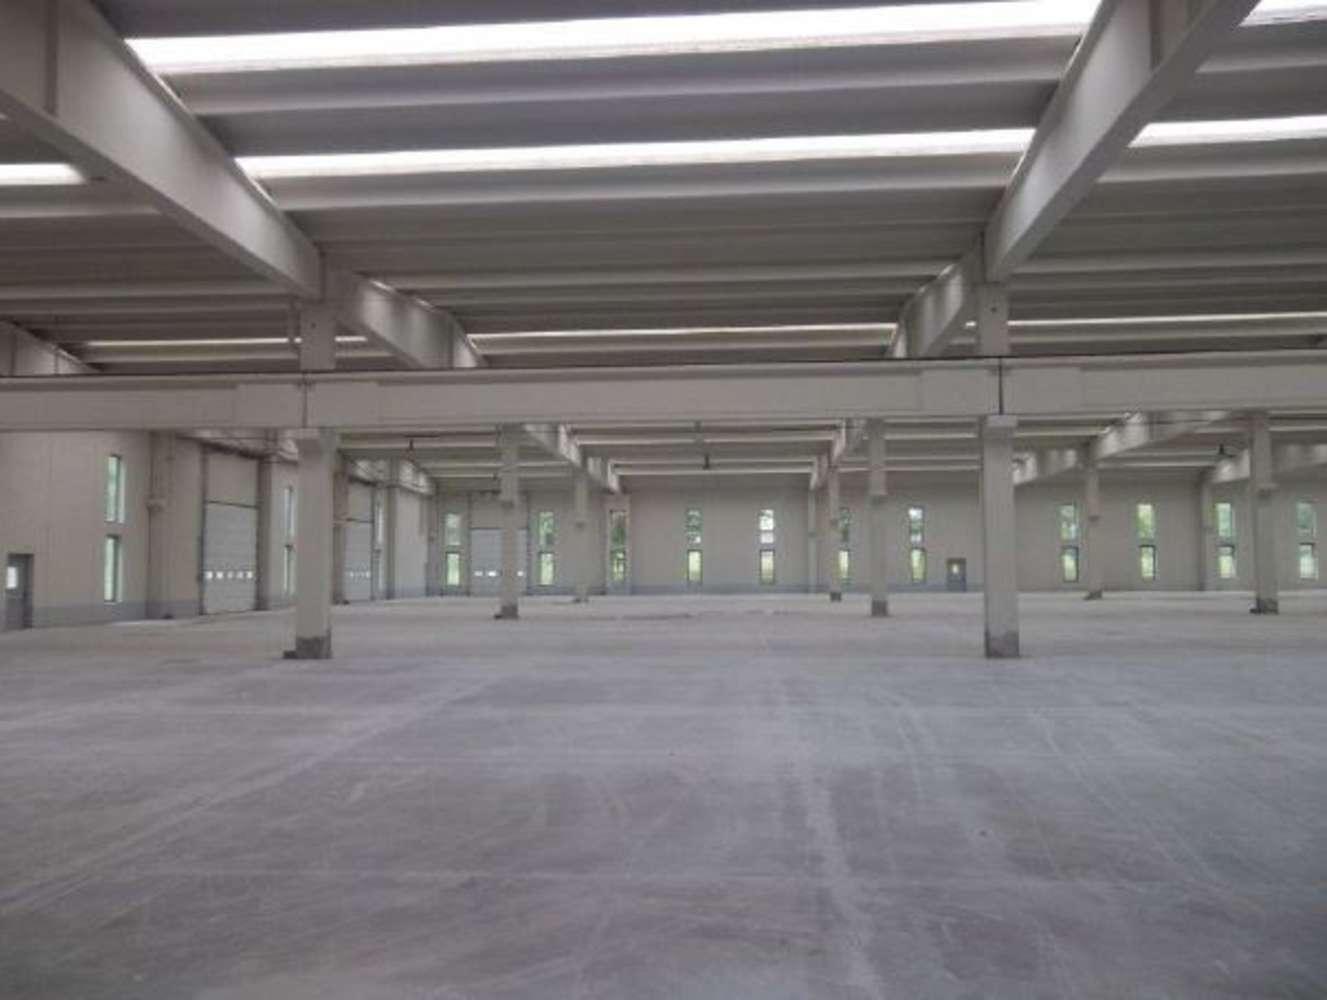 Magazzini industriali e logistici Issogne, 11020 - Capannoni logistici e uffici Aosta - 10033600